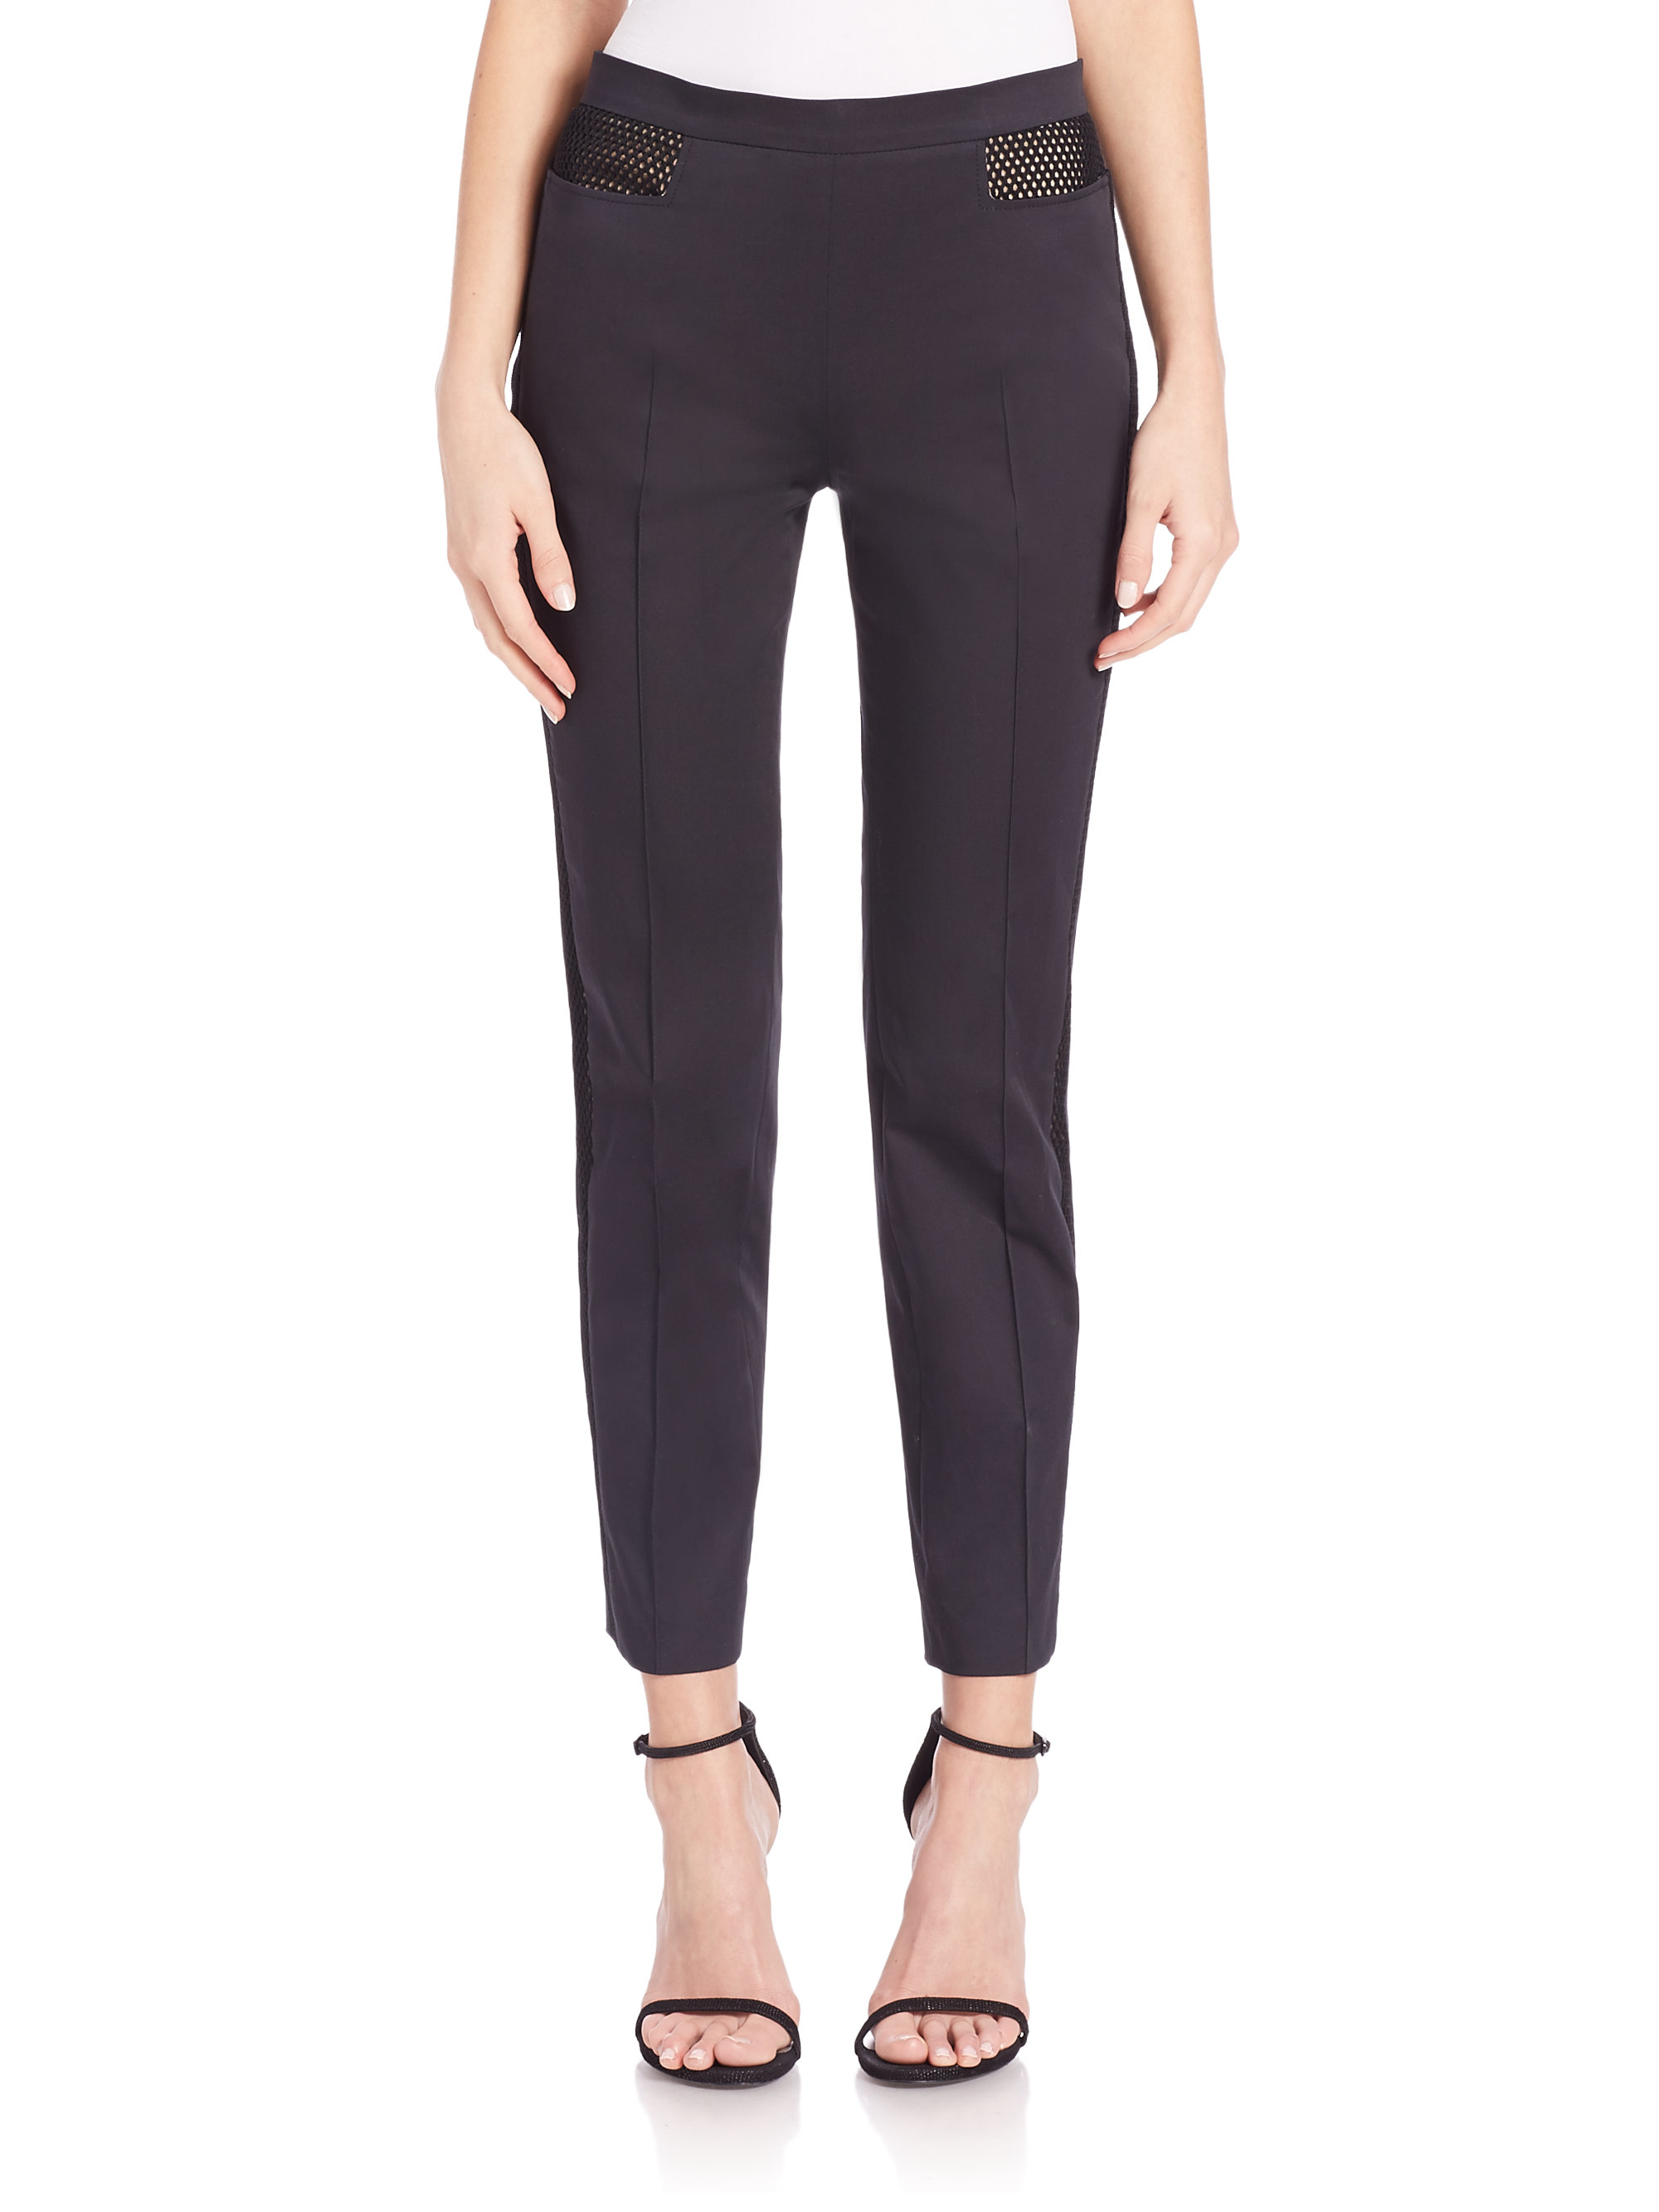 Unique Beepeak Women39s Long Mesh Yoga Pants Leggings White